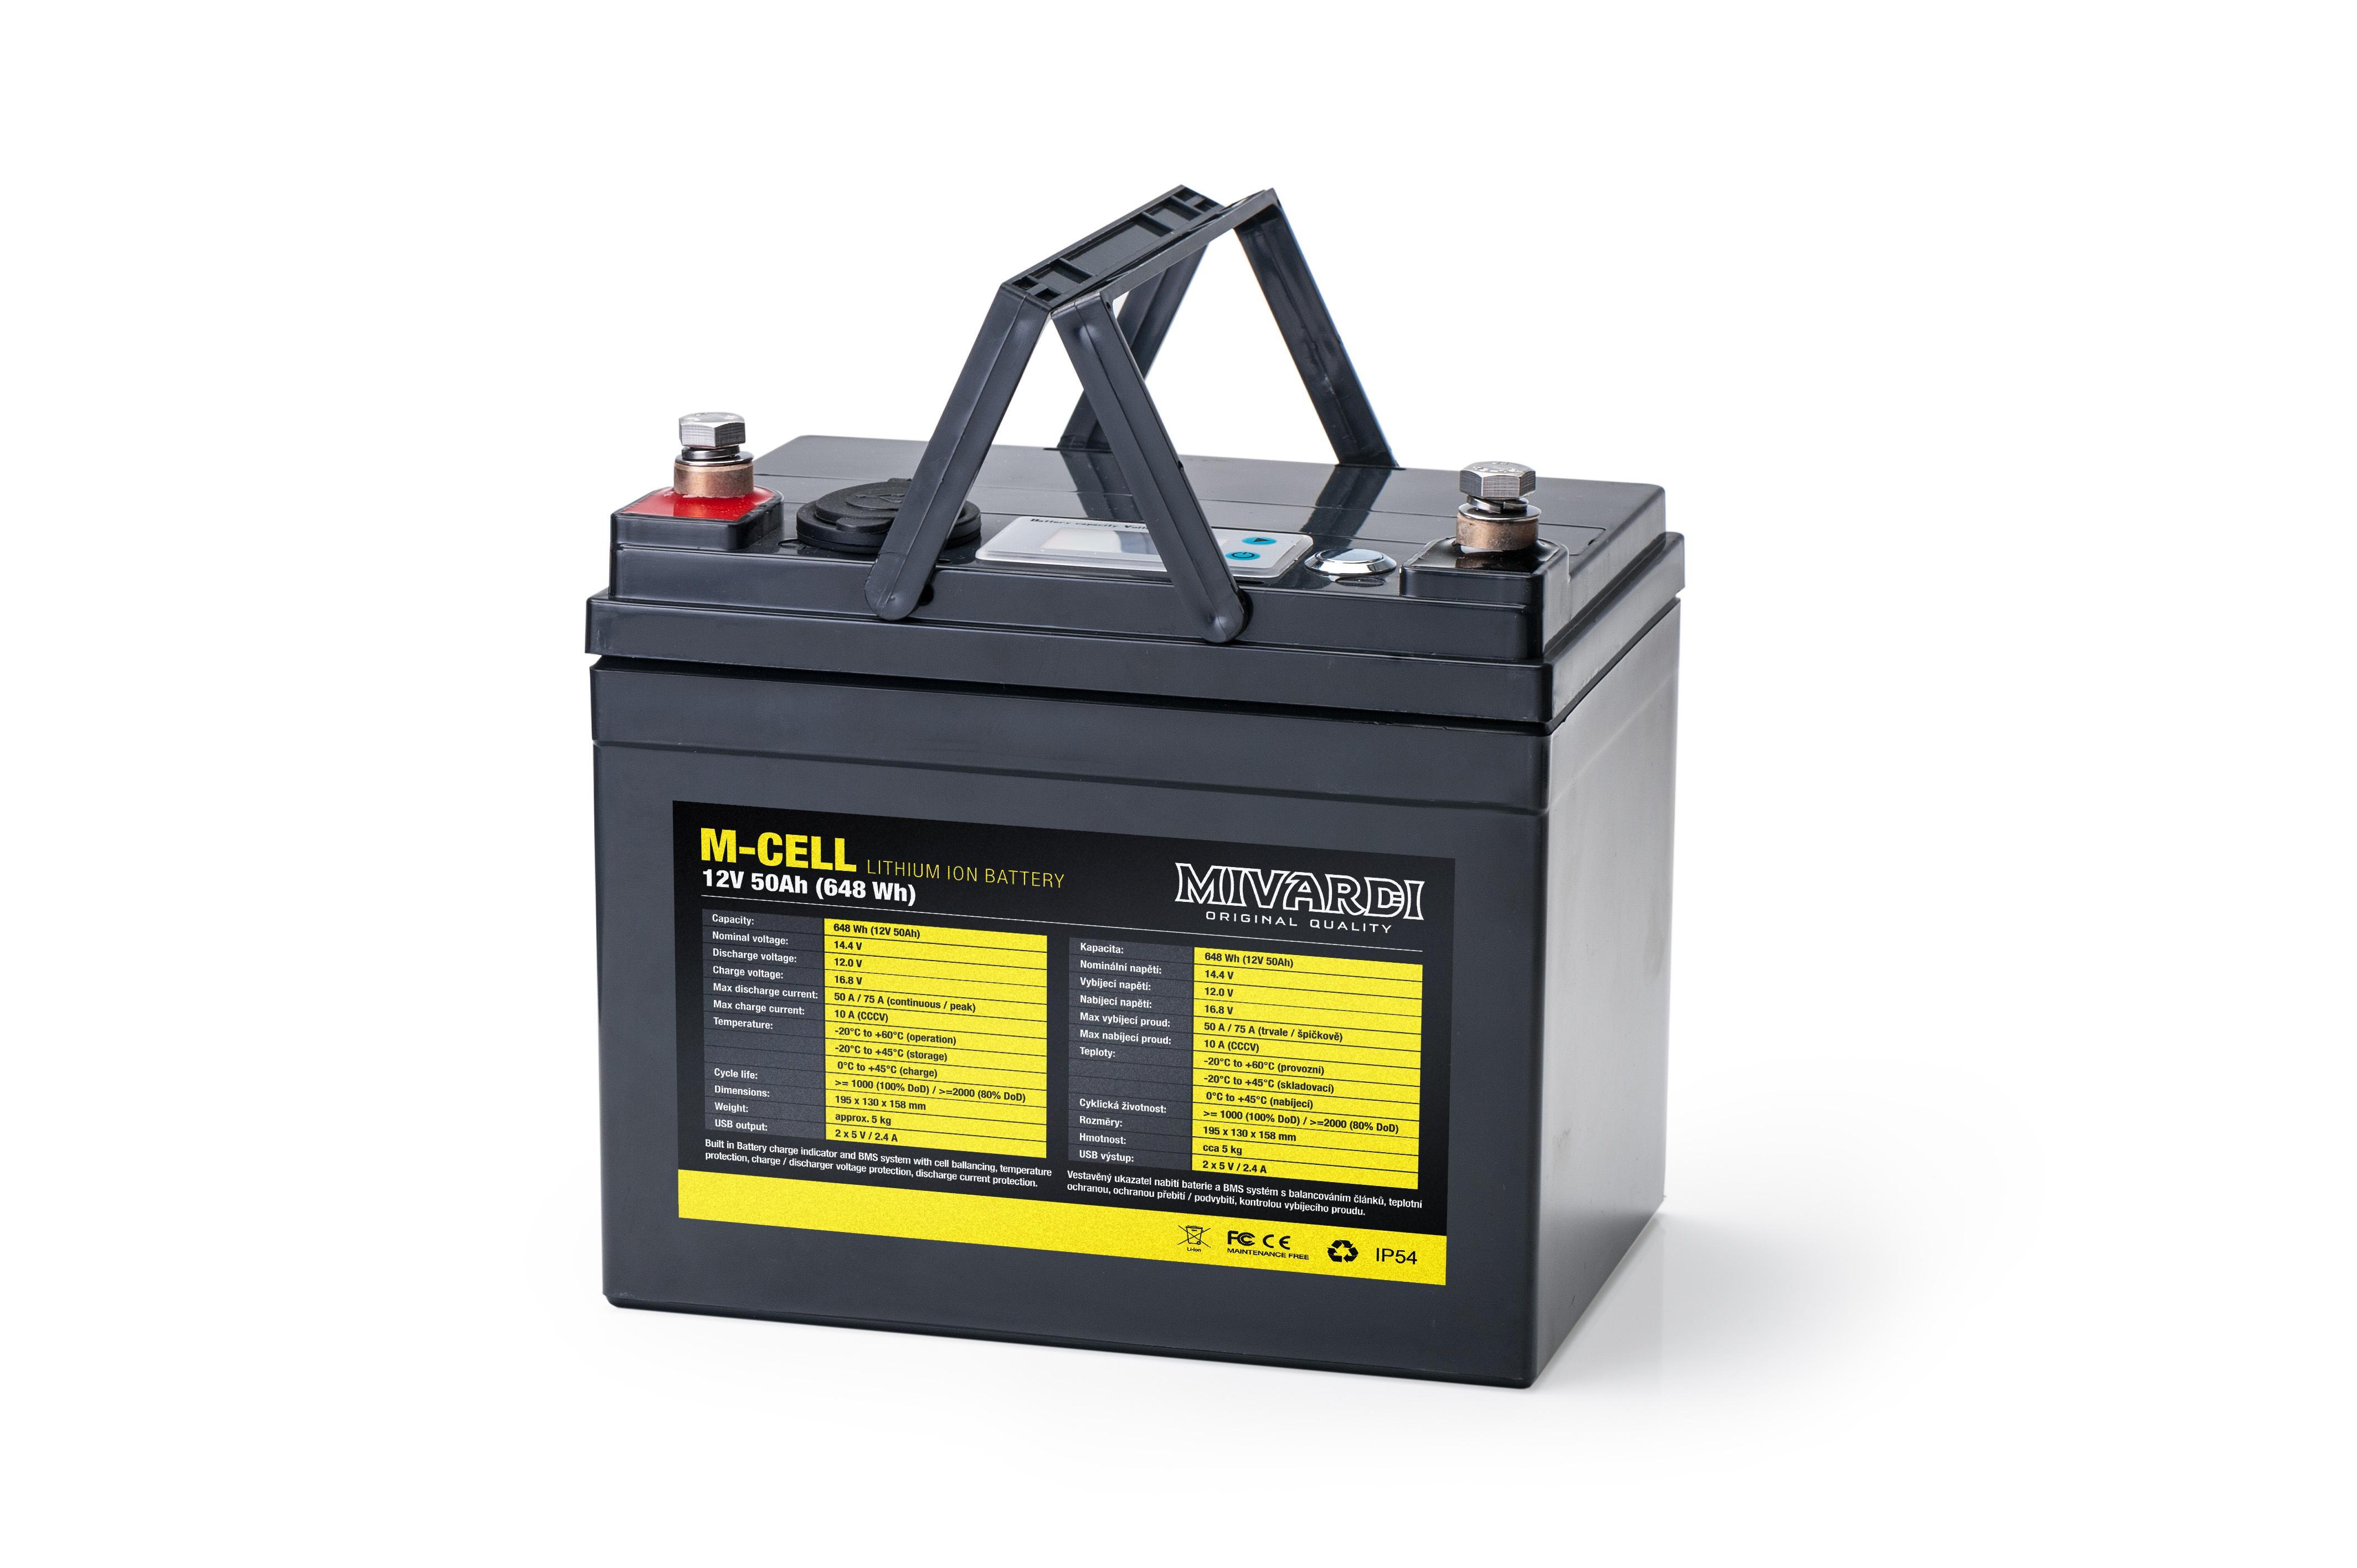 Lithiová baterie M-CELL M-CELL 12V 50Ah + 10A nabíječka